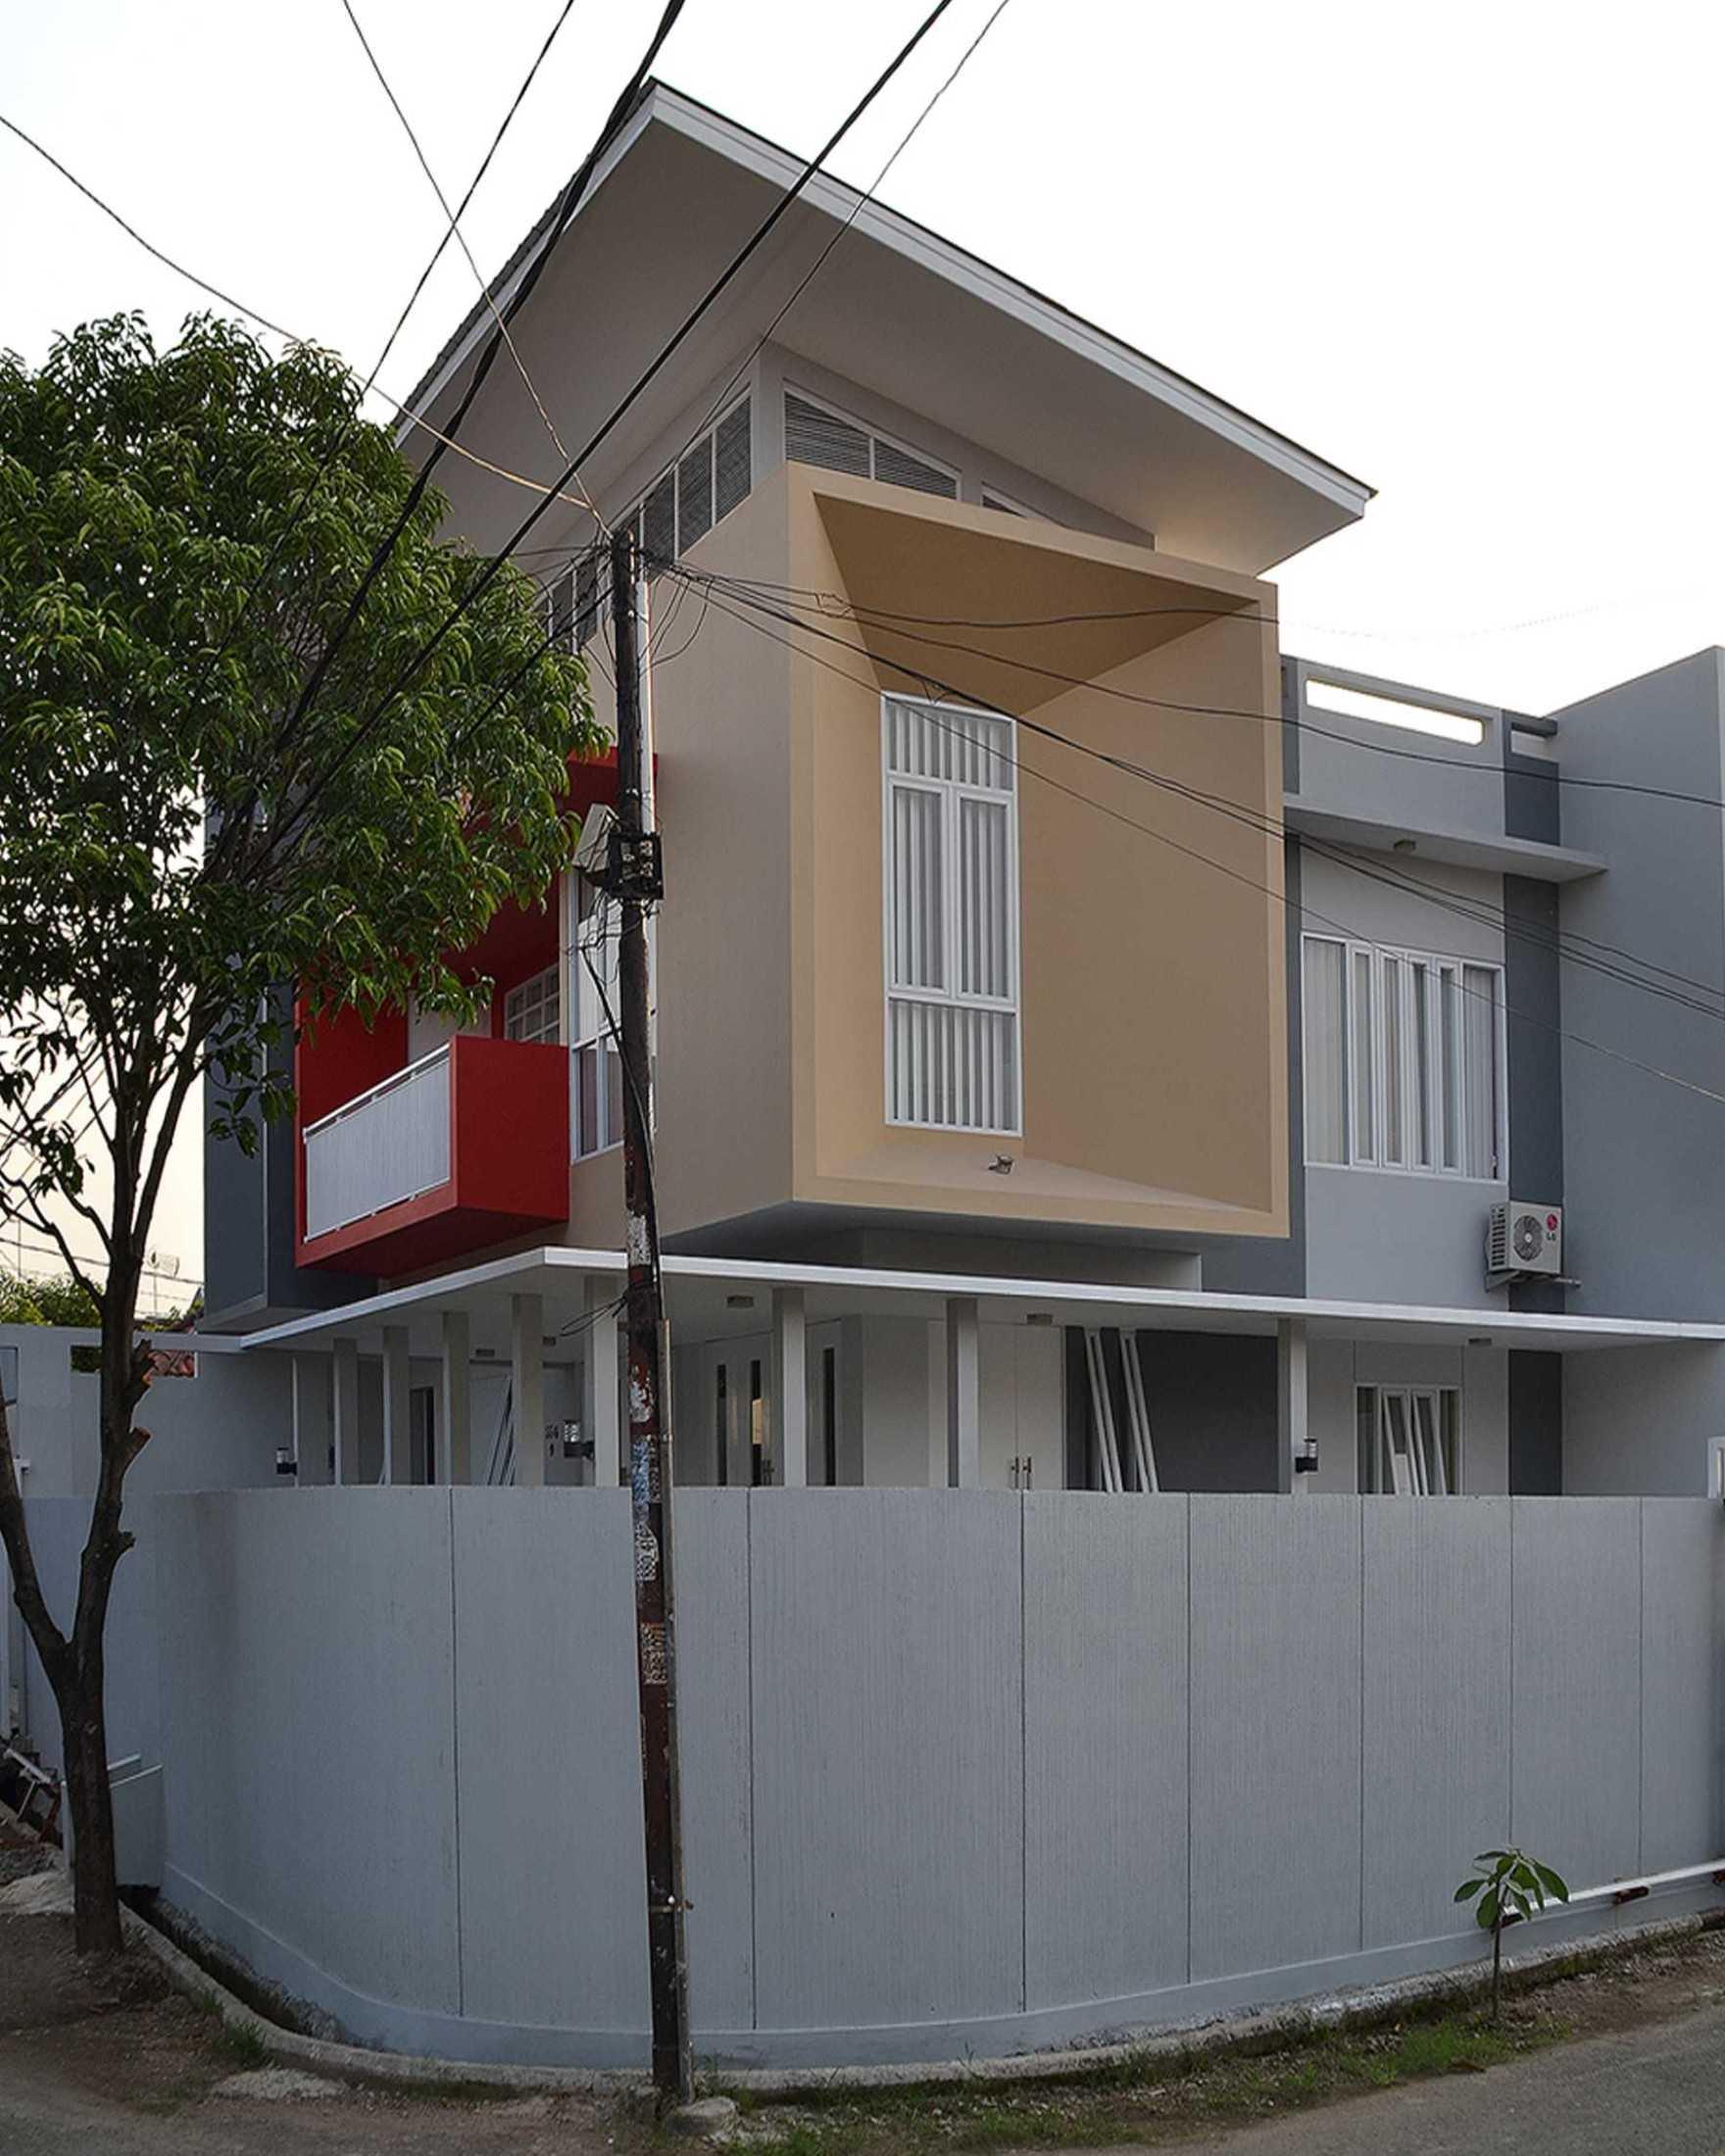 Arsitek Pramudya Rumah Bintara Bintara, Kec. Bekasi Bar., Kota Bks, Jawa Barat, Indonesia Bintara, Kec. Bekasi Bar., Kota Bks, Jawa Barat, Indonesia Arsitek-Pramudya-Rumah-Bintara  96765